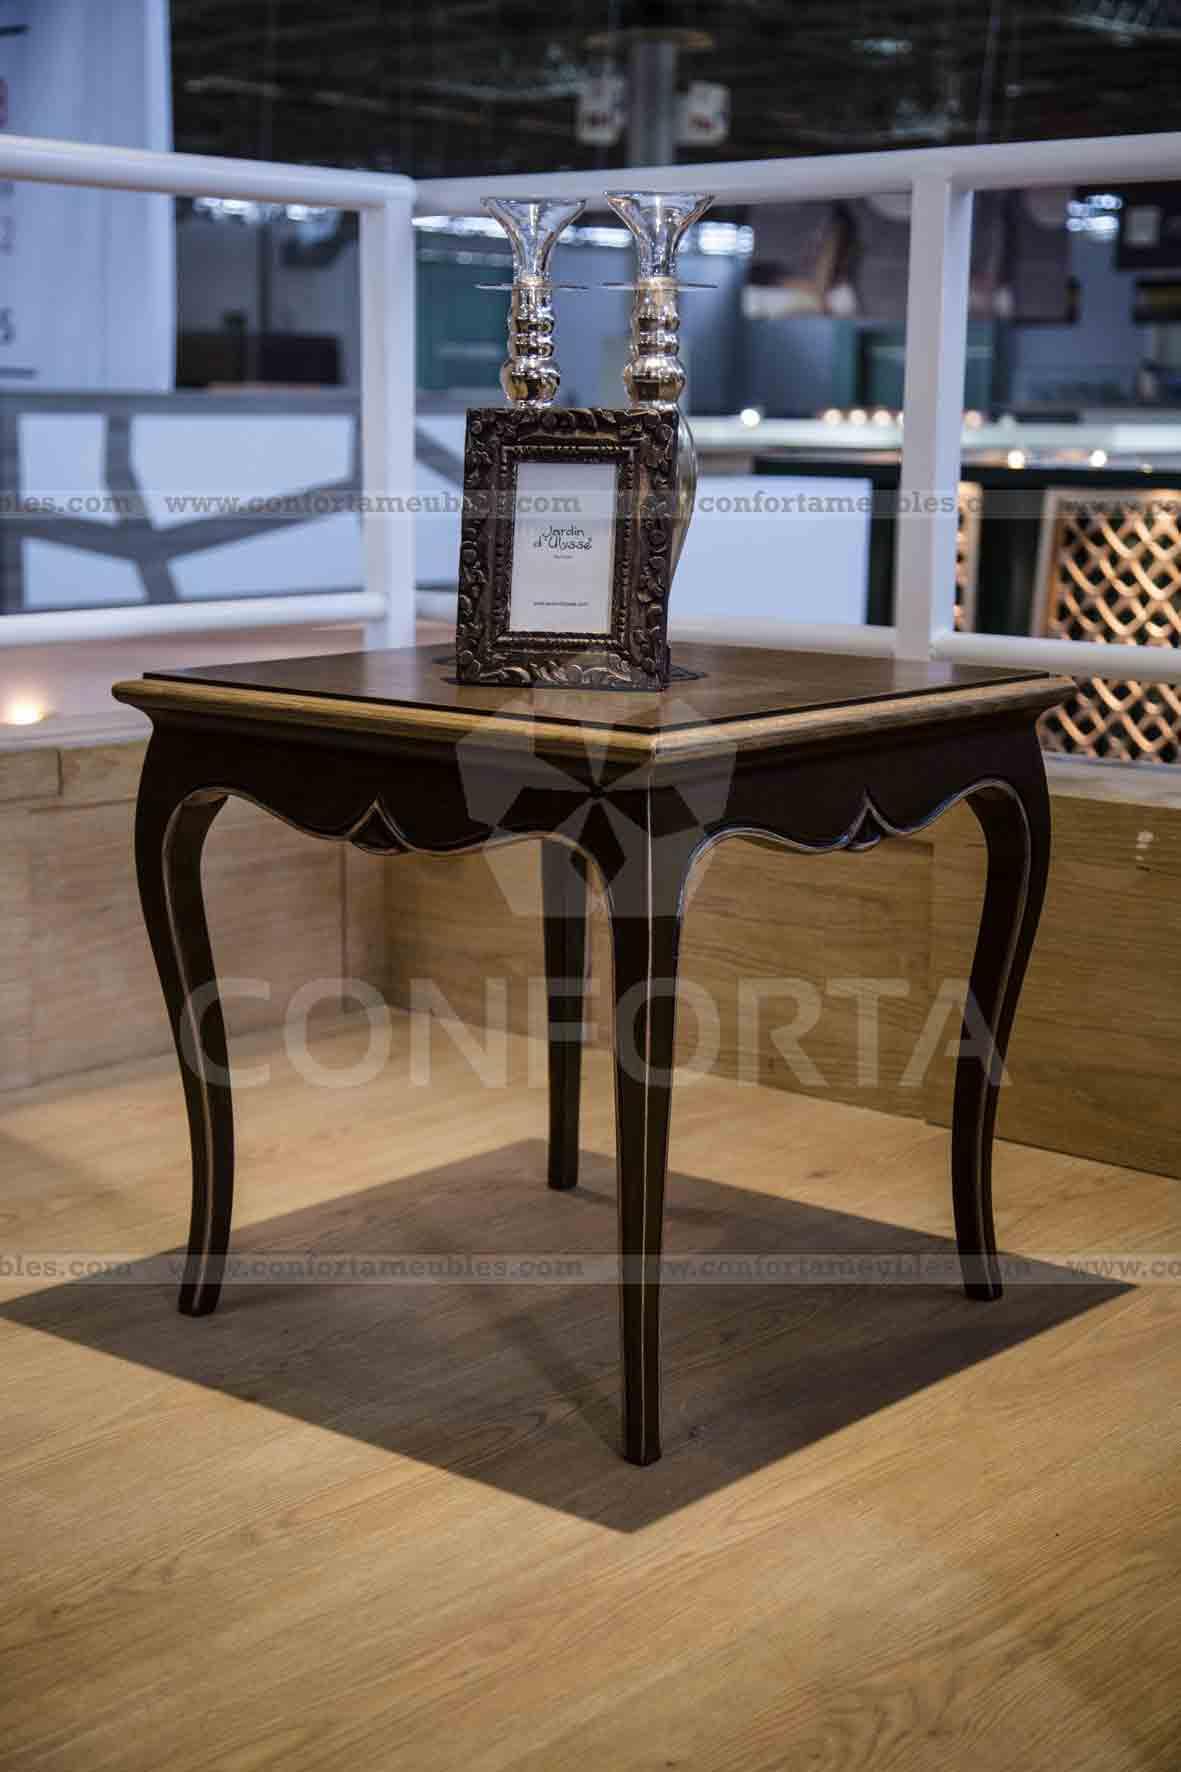 tables tunisie meubles et d coration tunisie. Black Bedroom Furniture Sets. Home Design Ideas